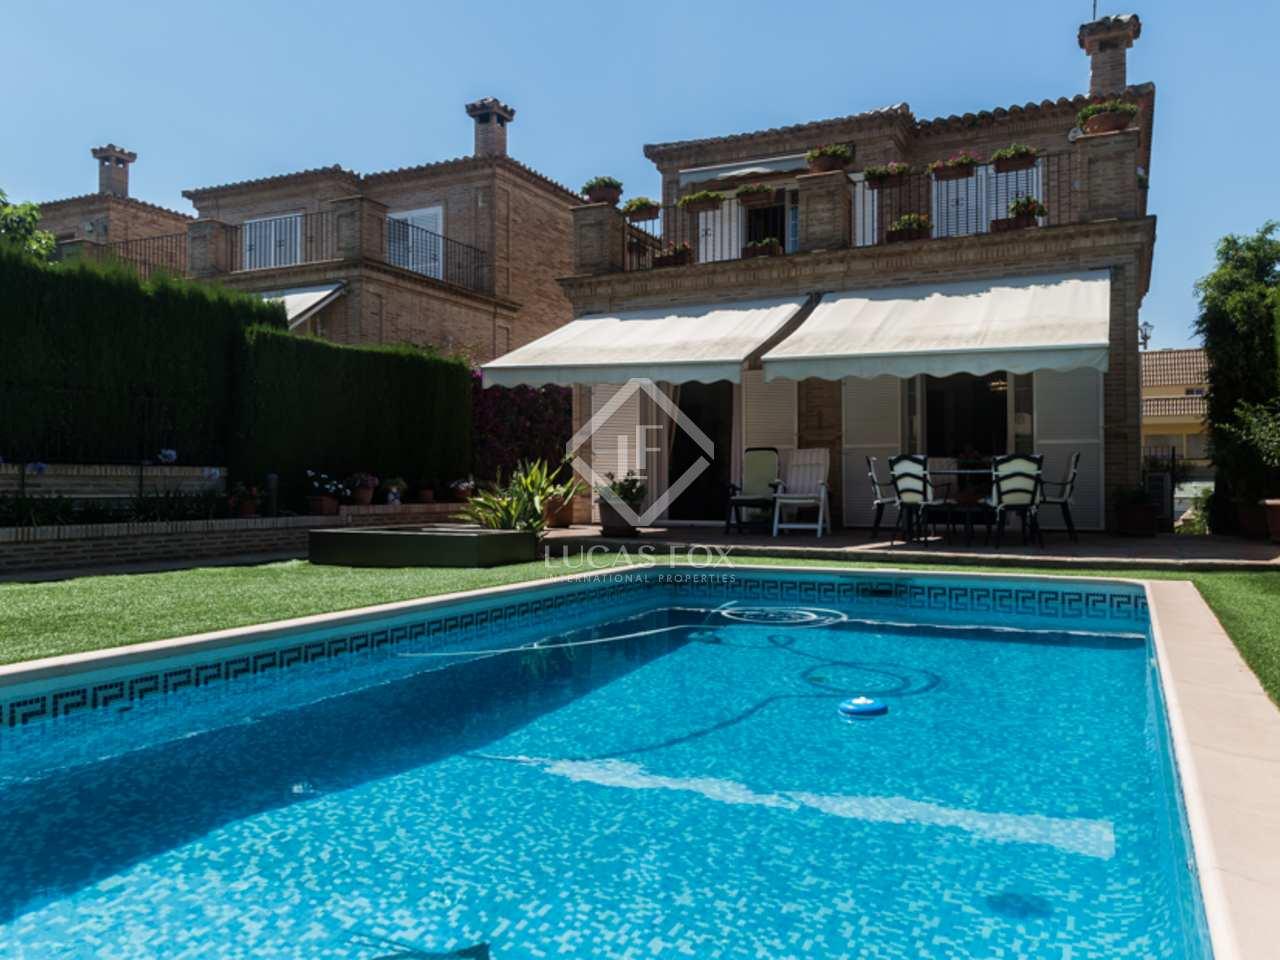 Villa en vente godella pr s du centre de valence en espagne for Piscine du polygone valence